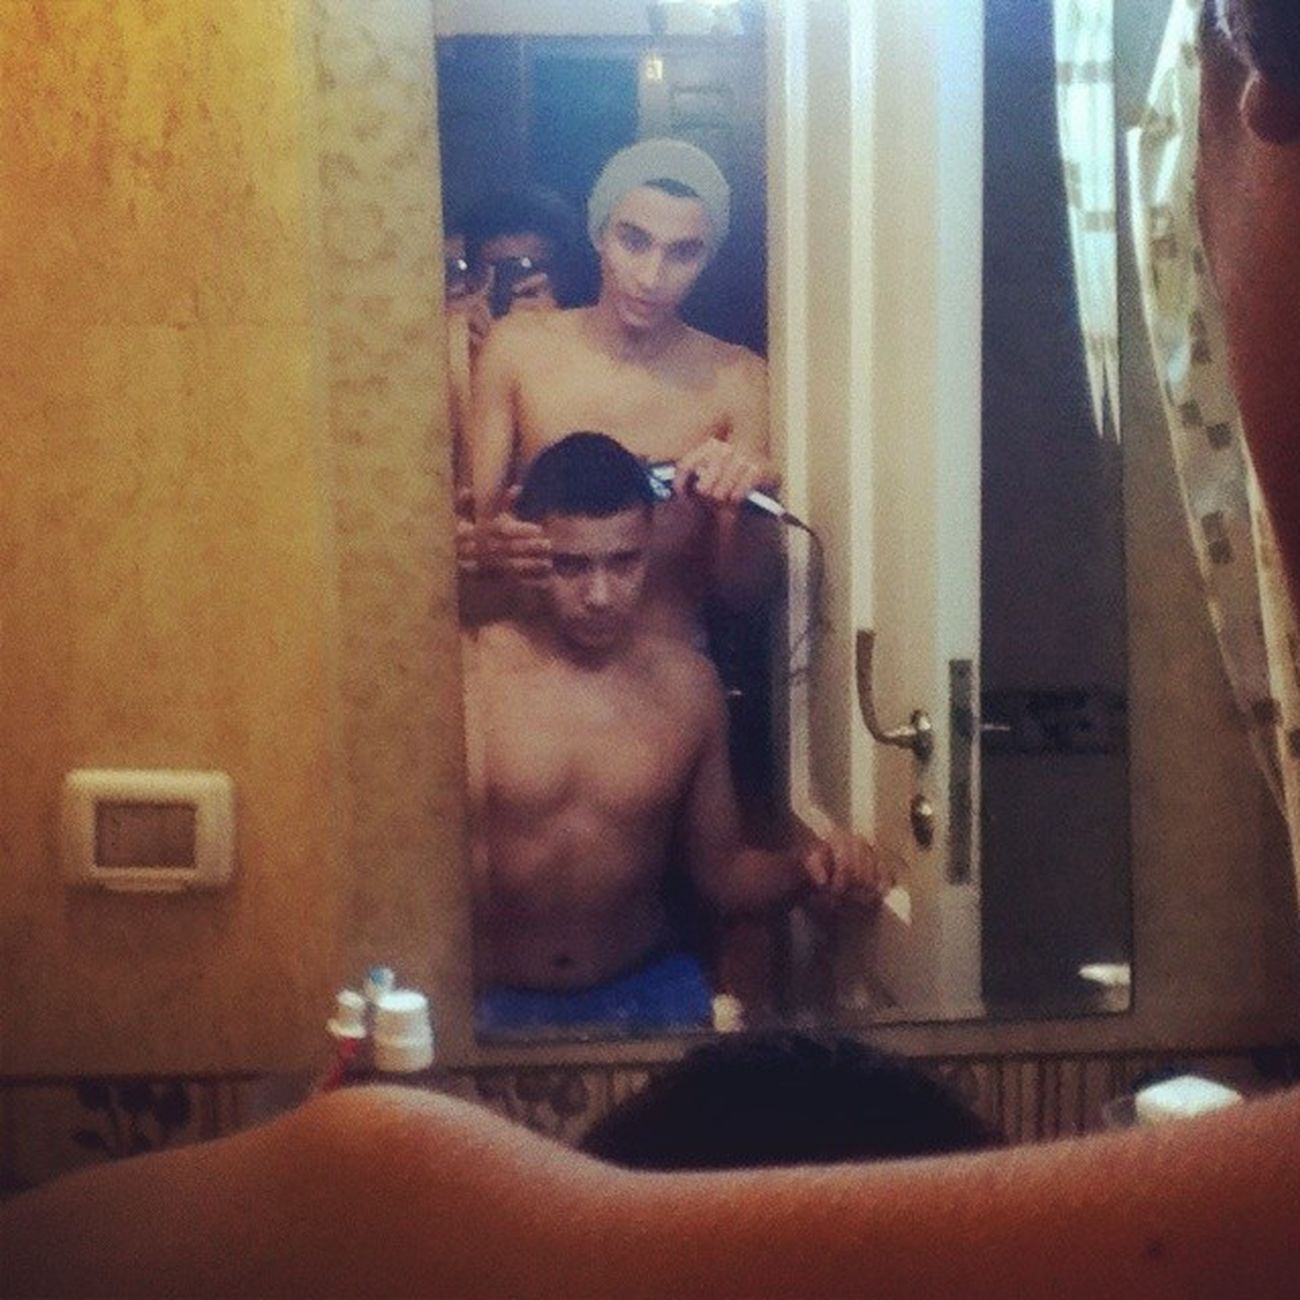 Shave Friend Barber Ismail mirror instaframe instashave fun finishing